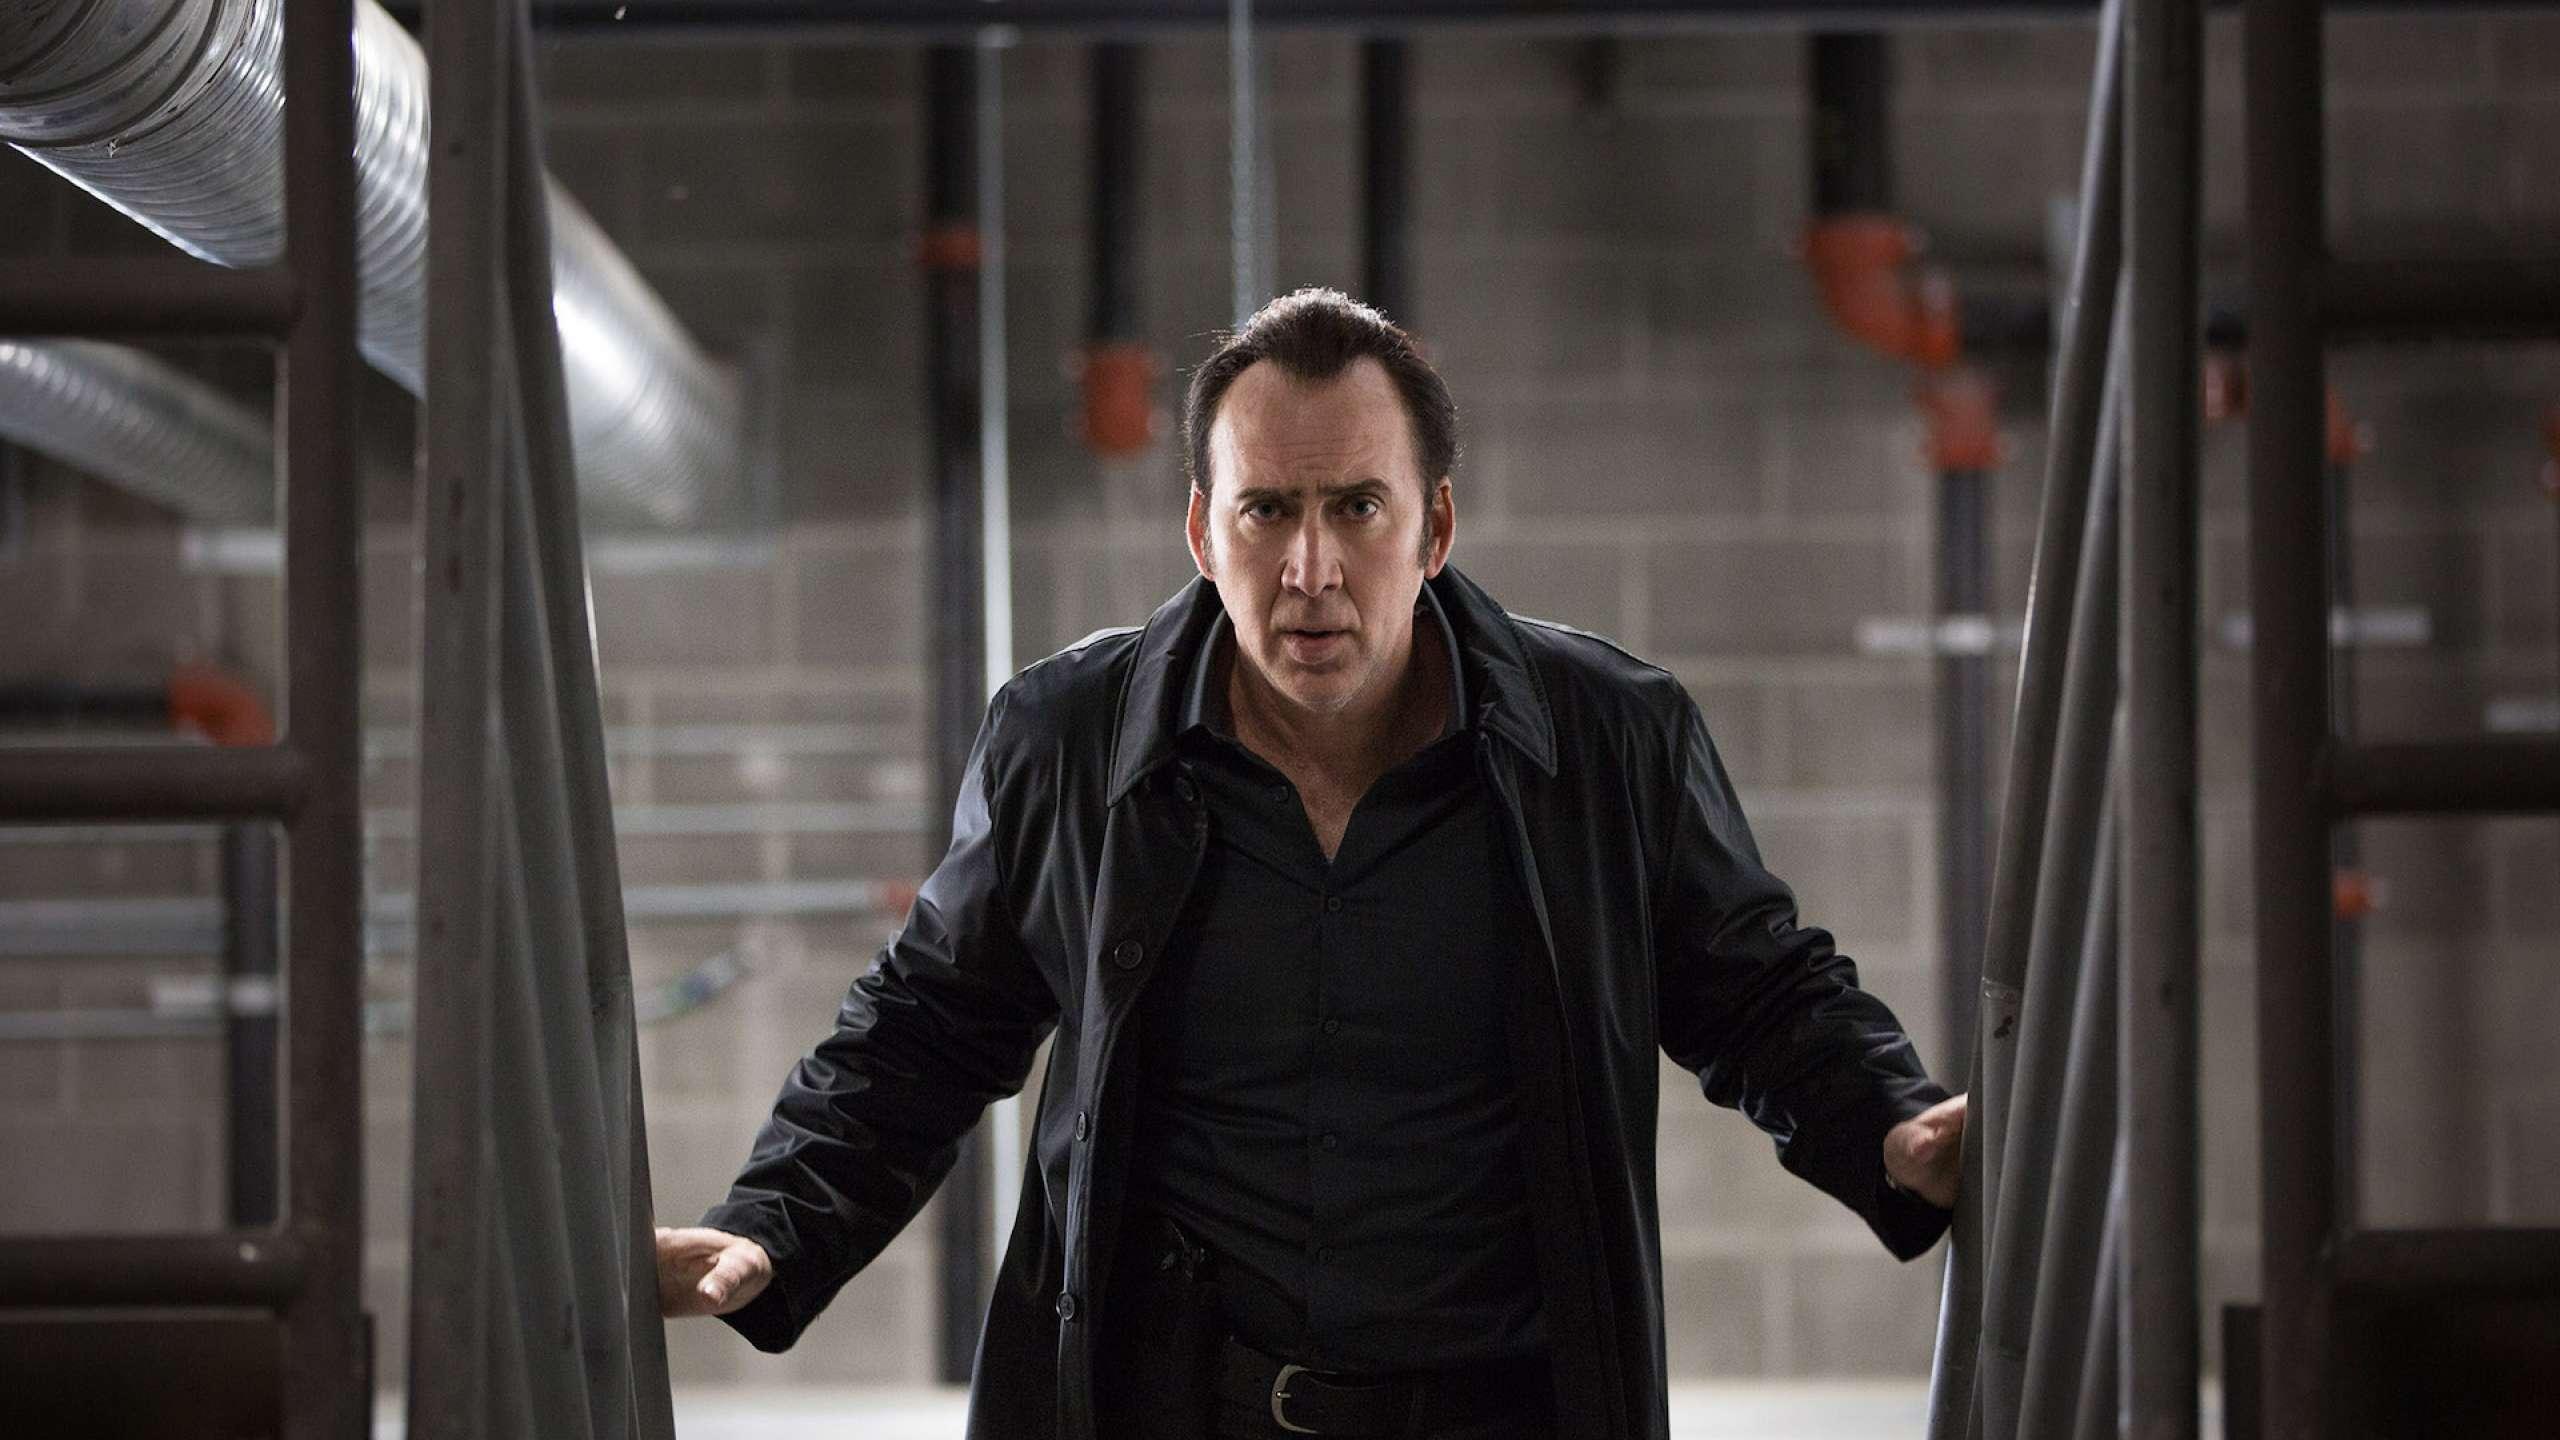 The bureau xcom declassified neuer trailer mit agent ennis cole